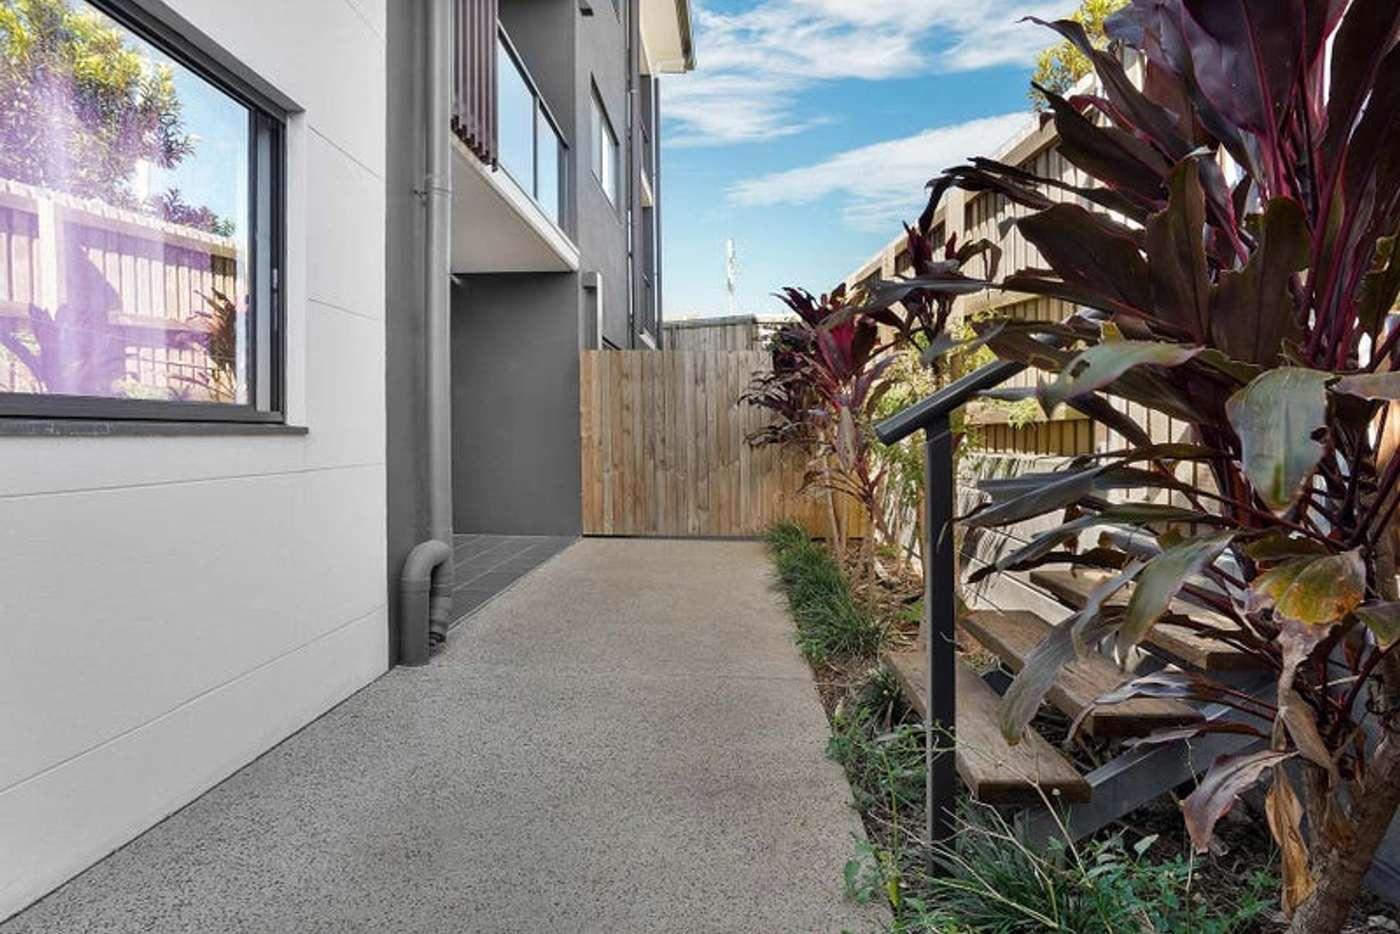 Main view of Homely unit listing, 3/27 Lumley Street, Upper Mount Gravatt QLD 4122